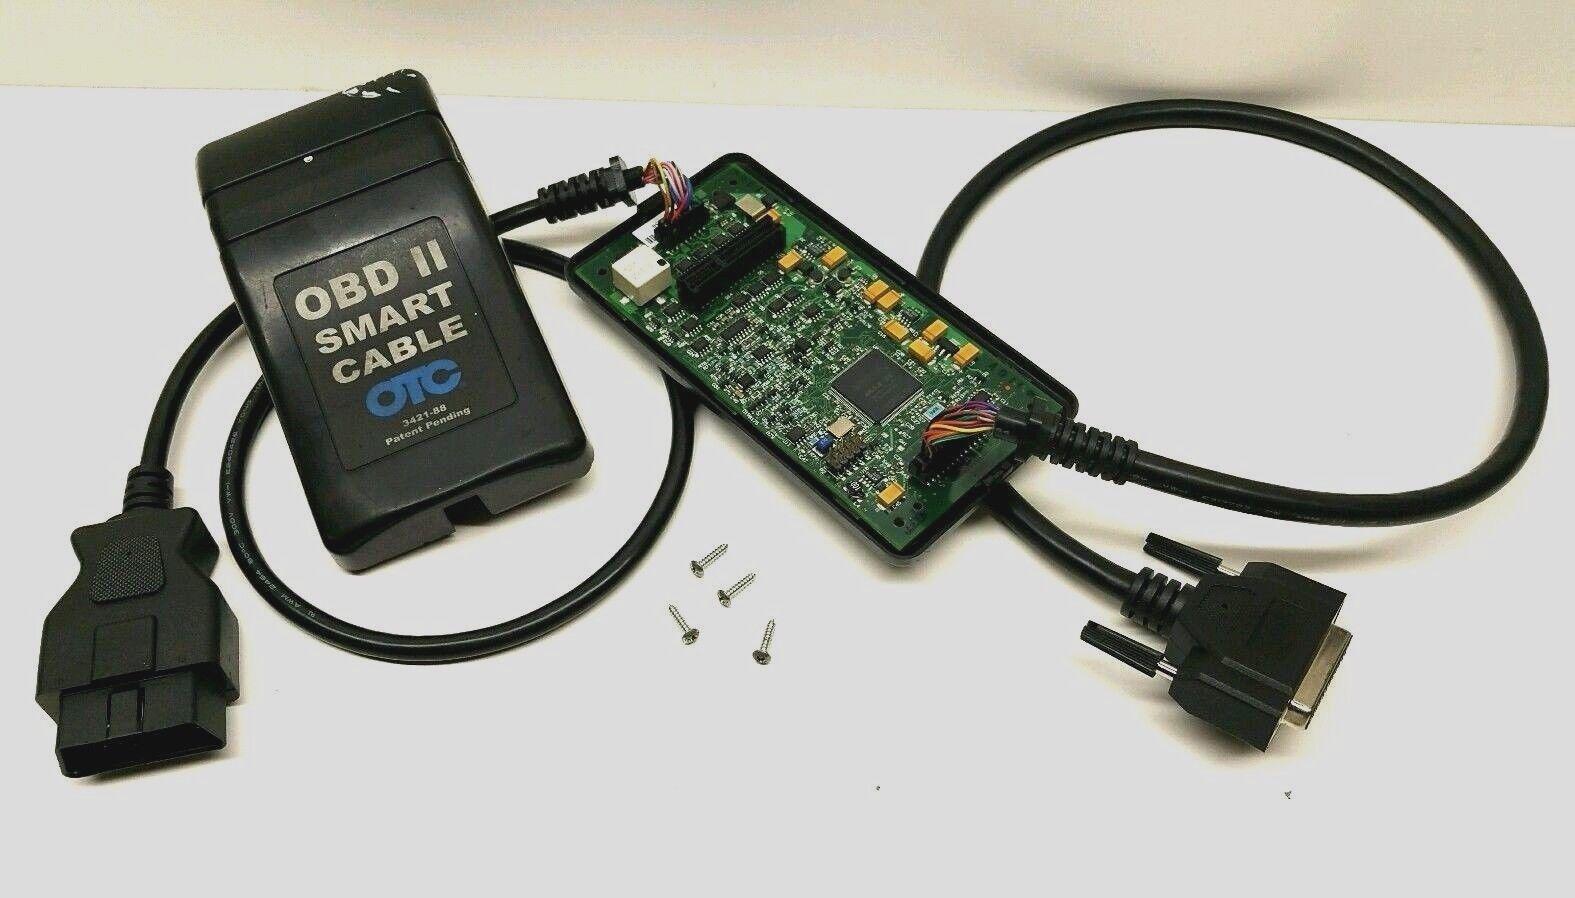 Otc Genisys Matco Determinator Mac Tools Mentor Obd2 Obdii Smart 78265 Voltage Drop Pro Circuit Tester From Hickok Waekon Cable 3421 88